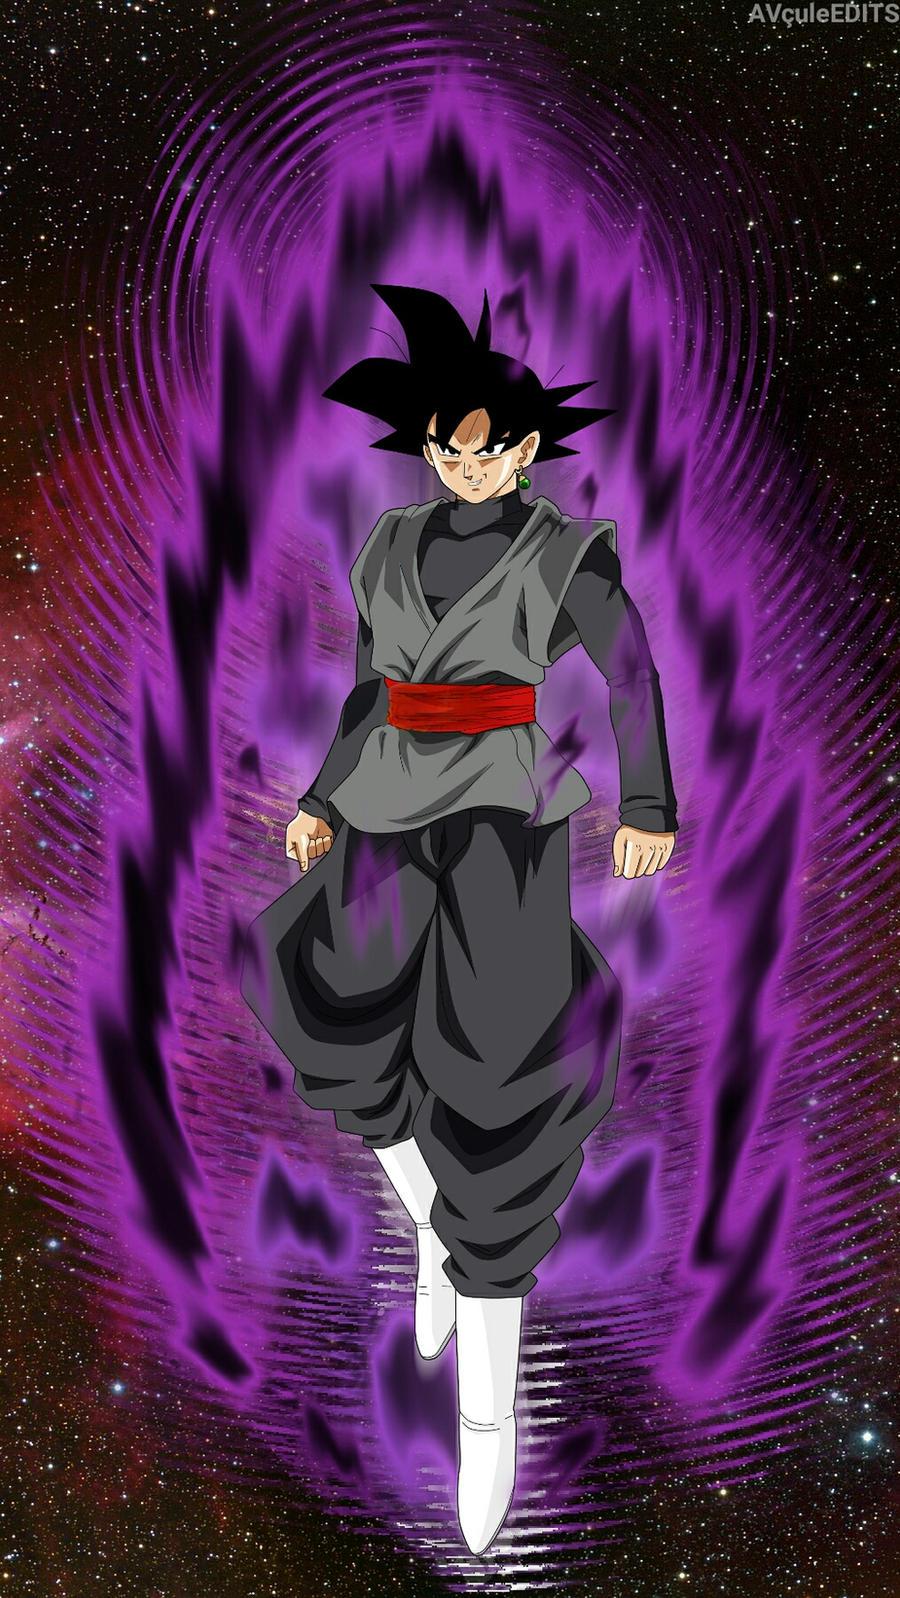 Goku Black Normal Form Ki Up by AbhinavtheCule on DeviantArt